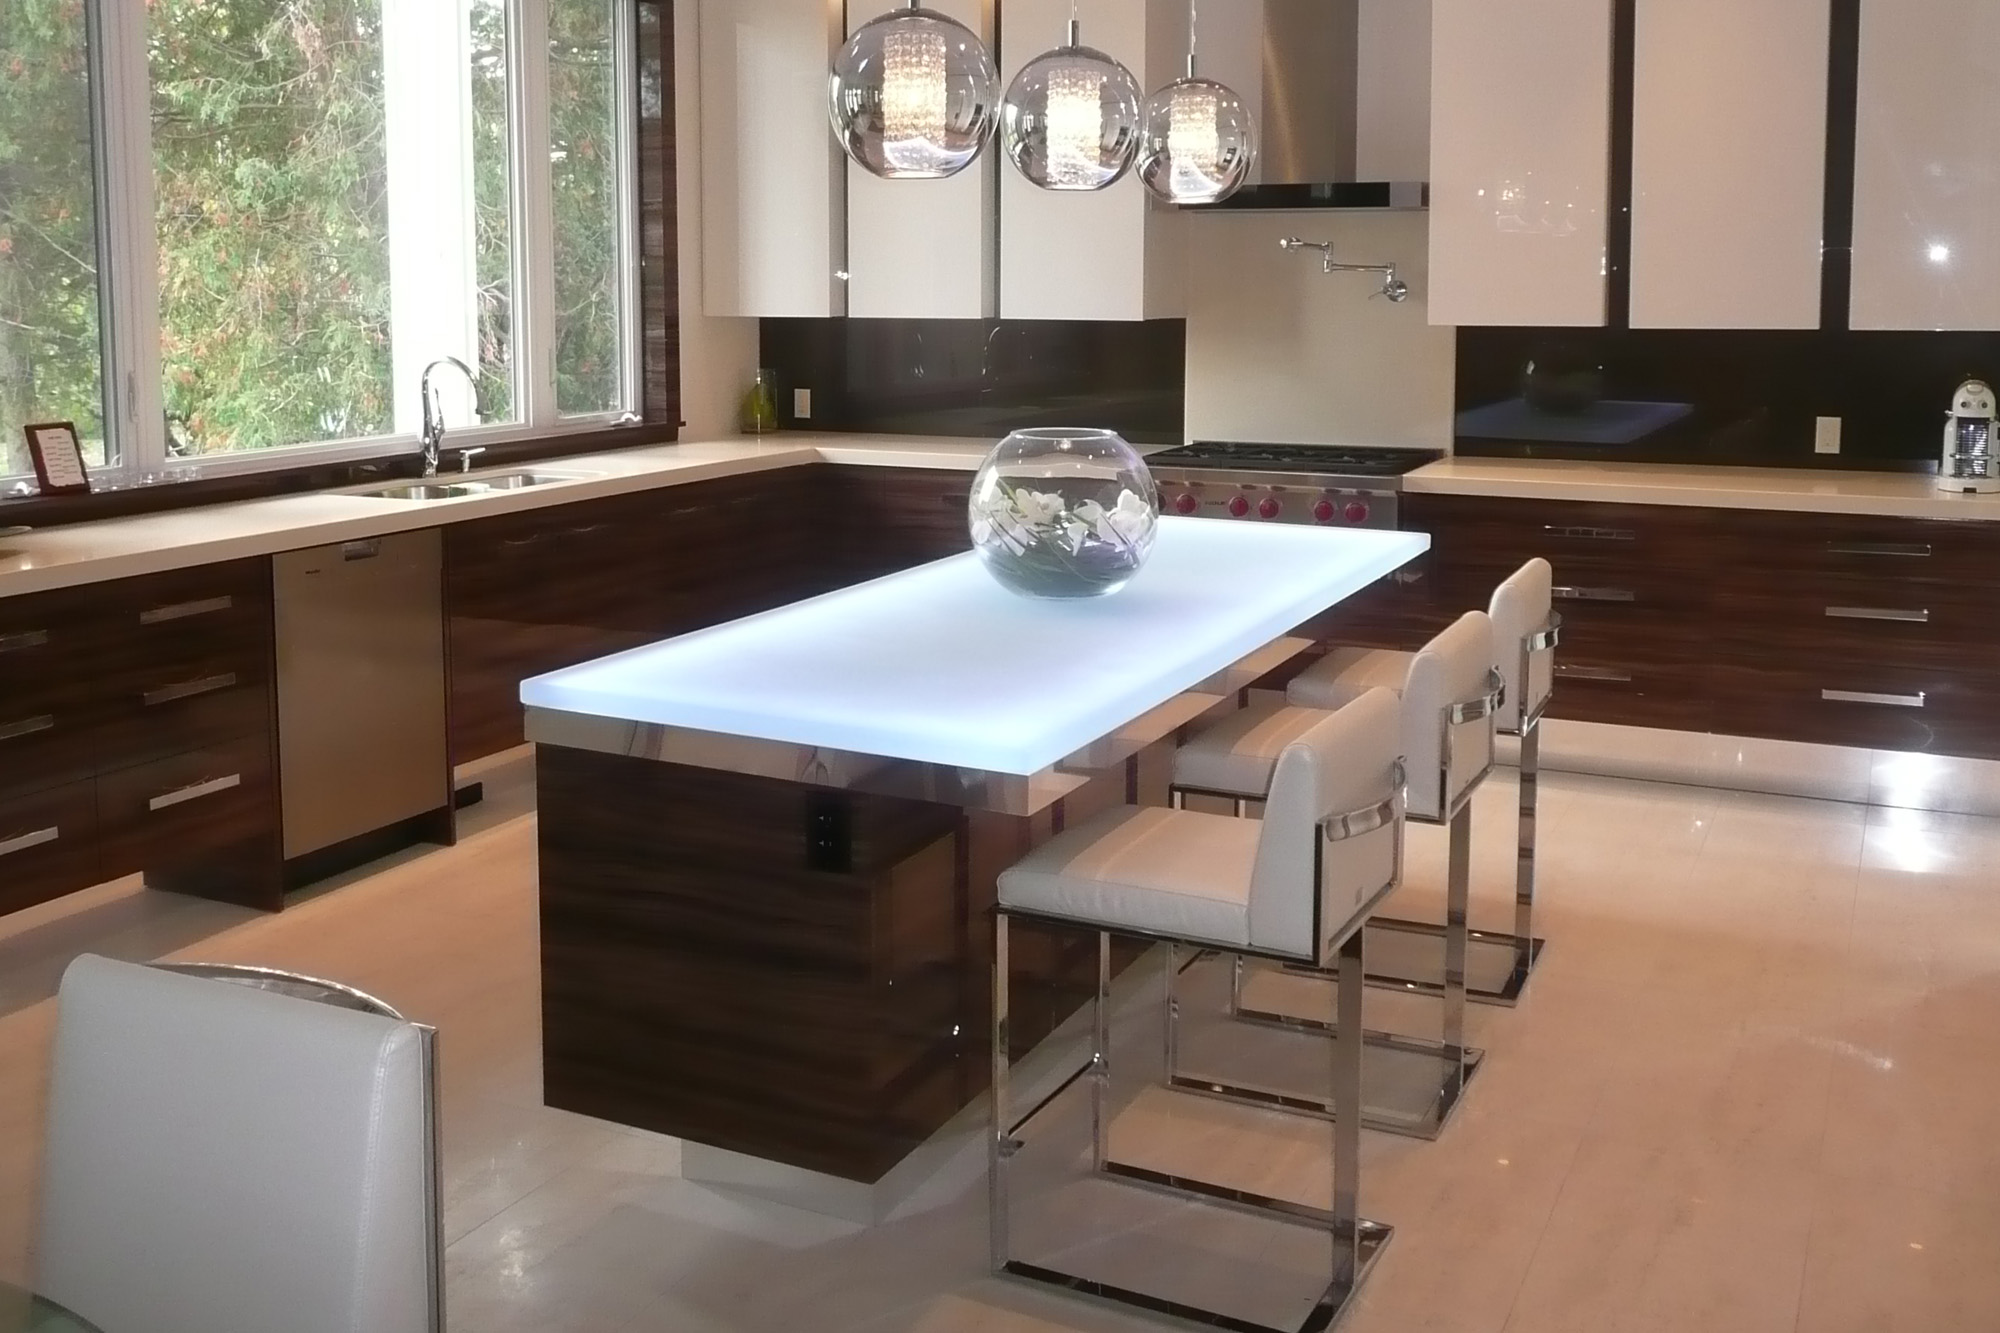 6 popular glass countertop types glass kitchen countertops Glass Kitchen Island Countertop kitchenisland3